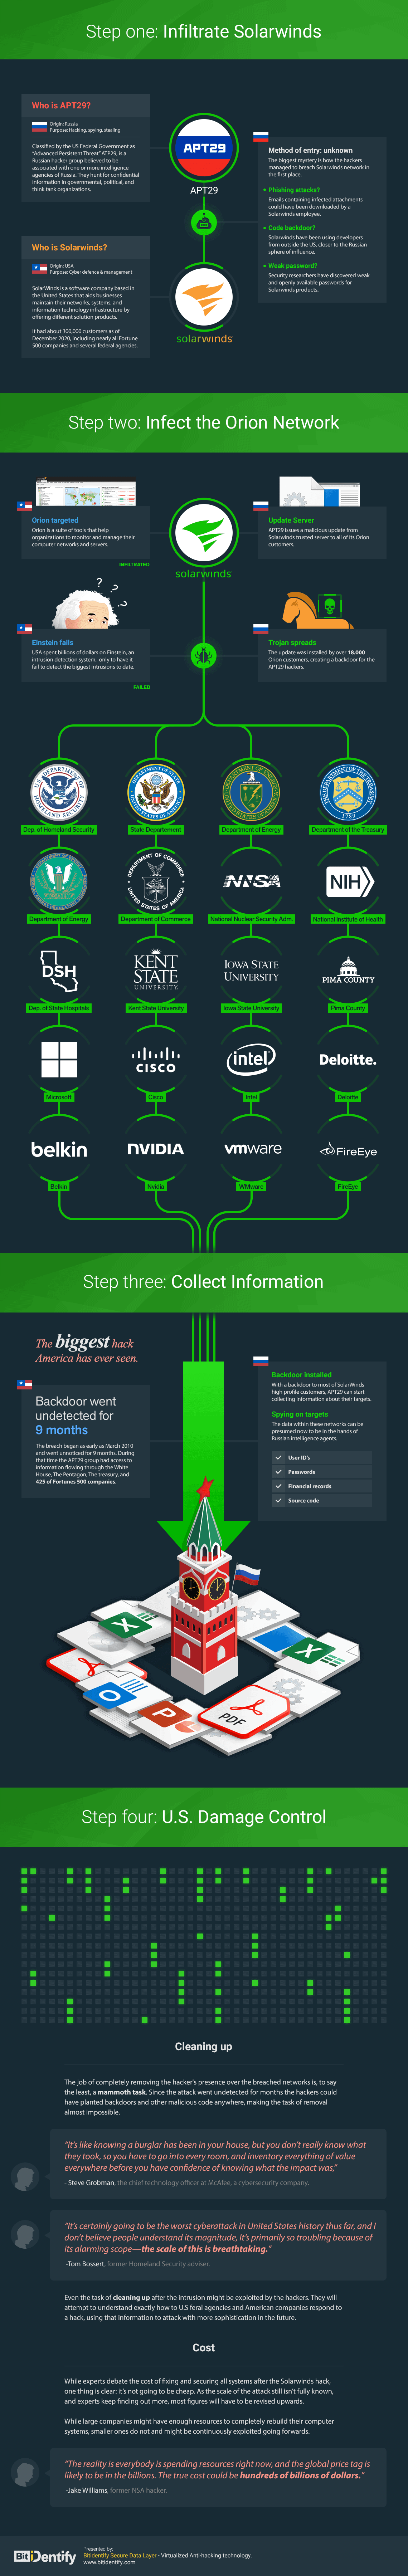 SolarWinds Hack Infographics